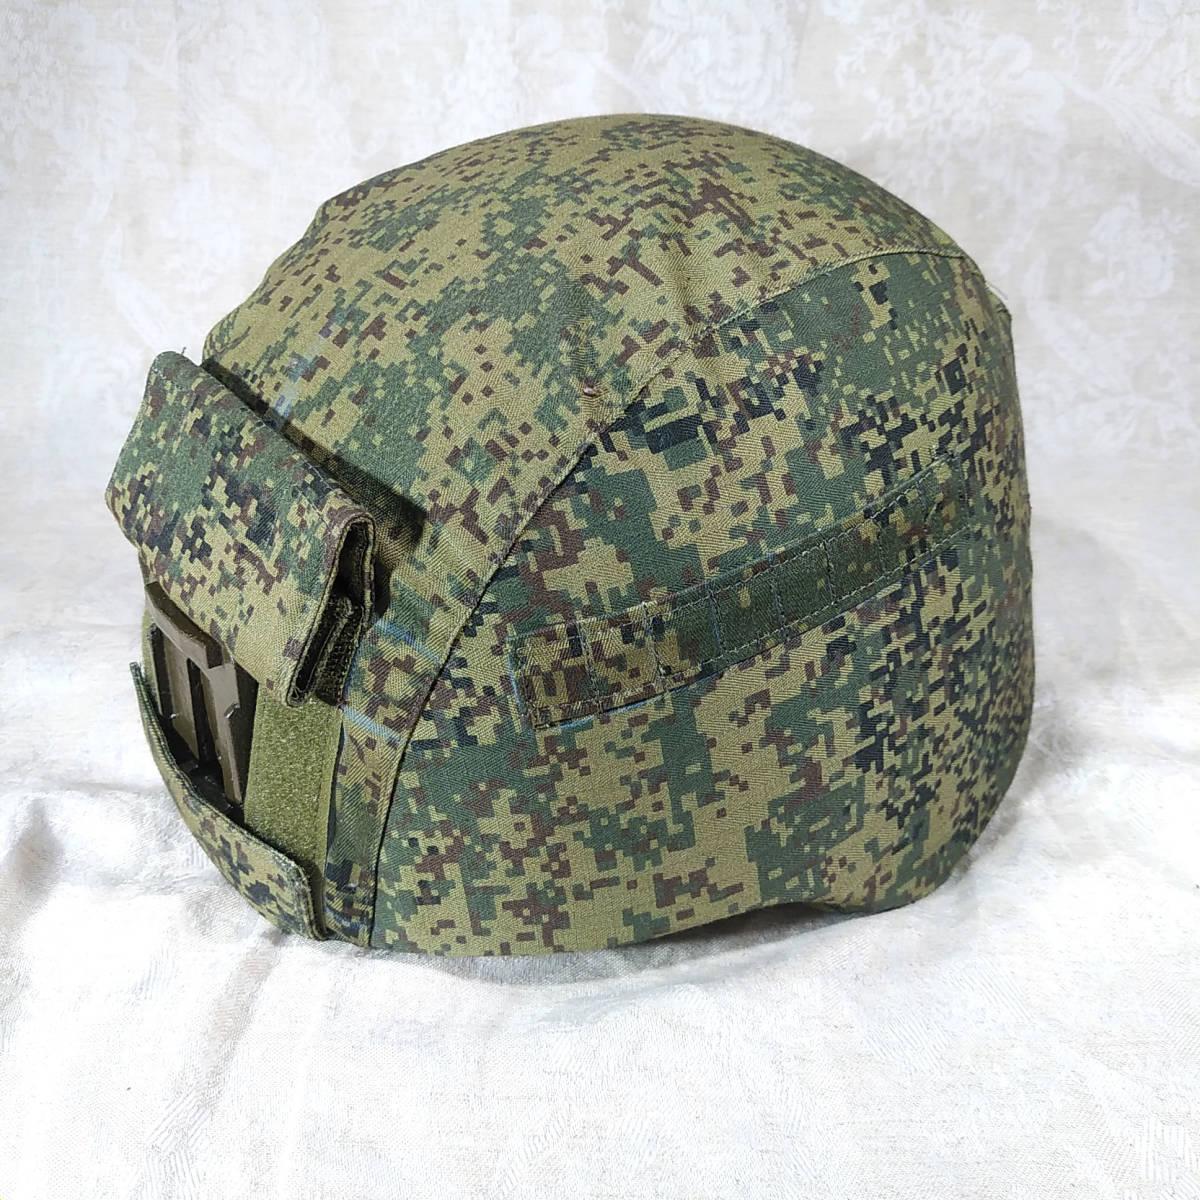 new goods /  product Russia army helmet 6B47 replica digital